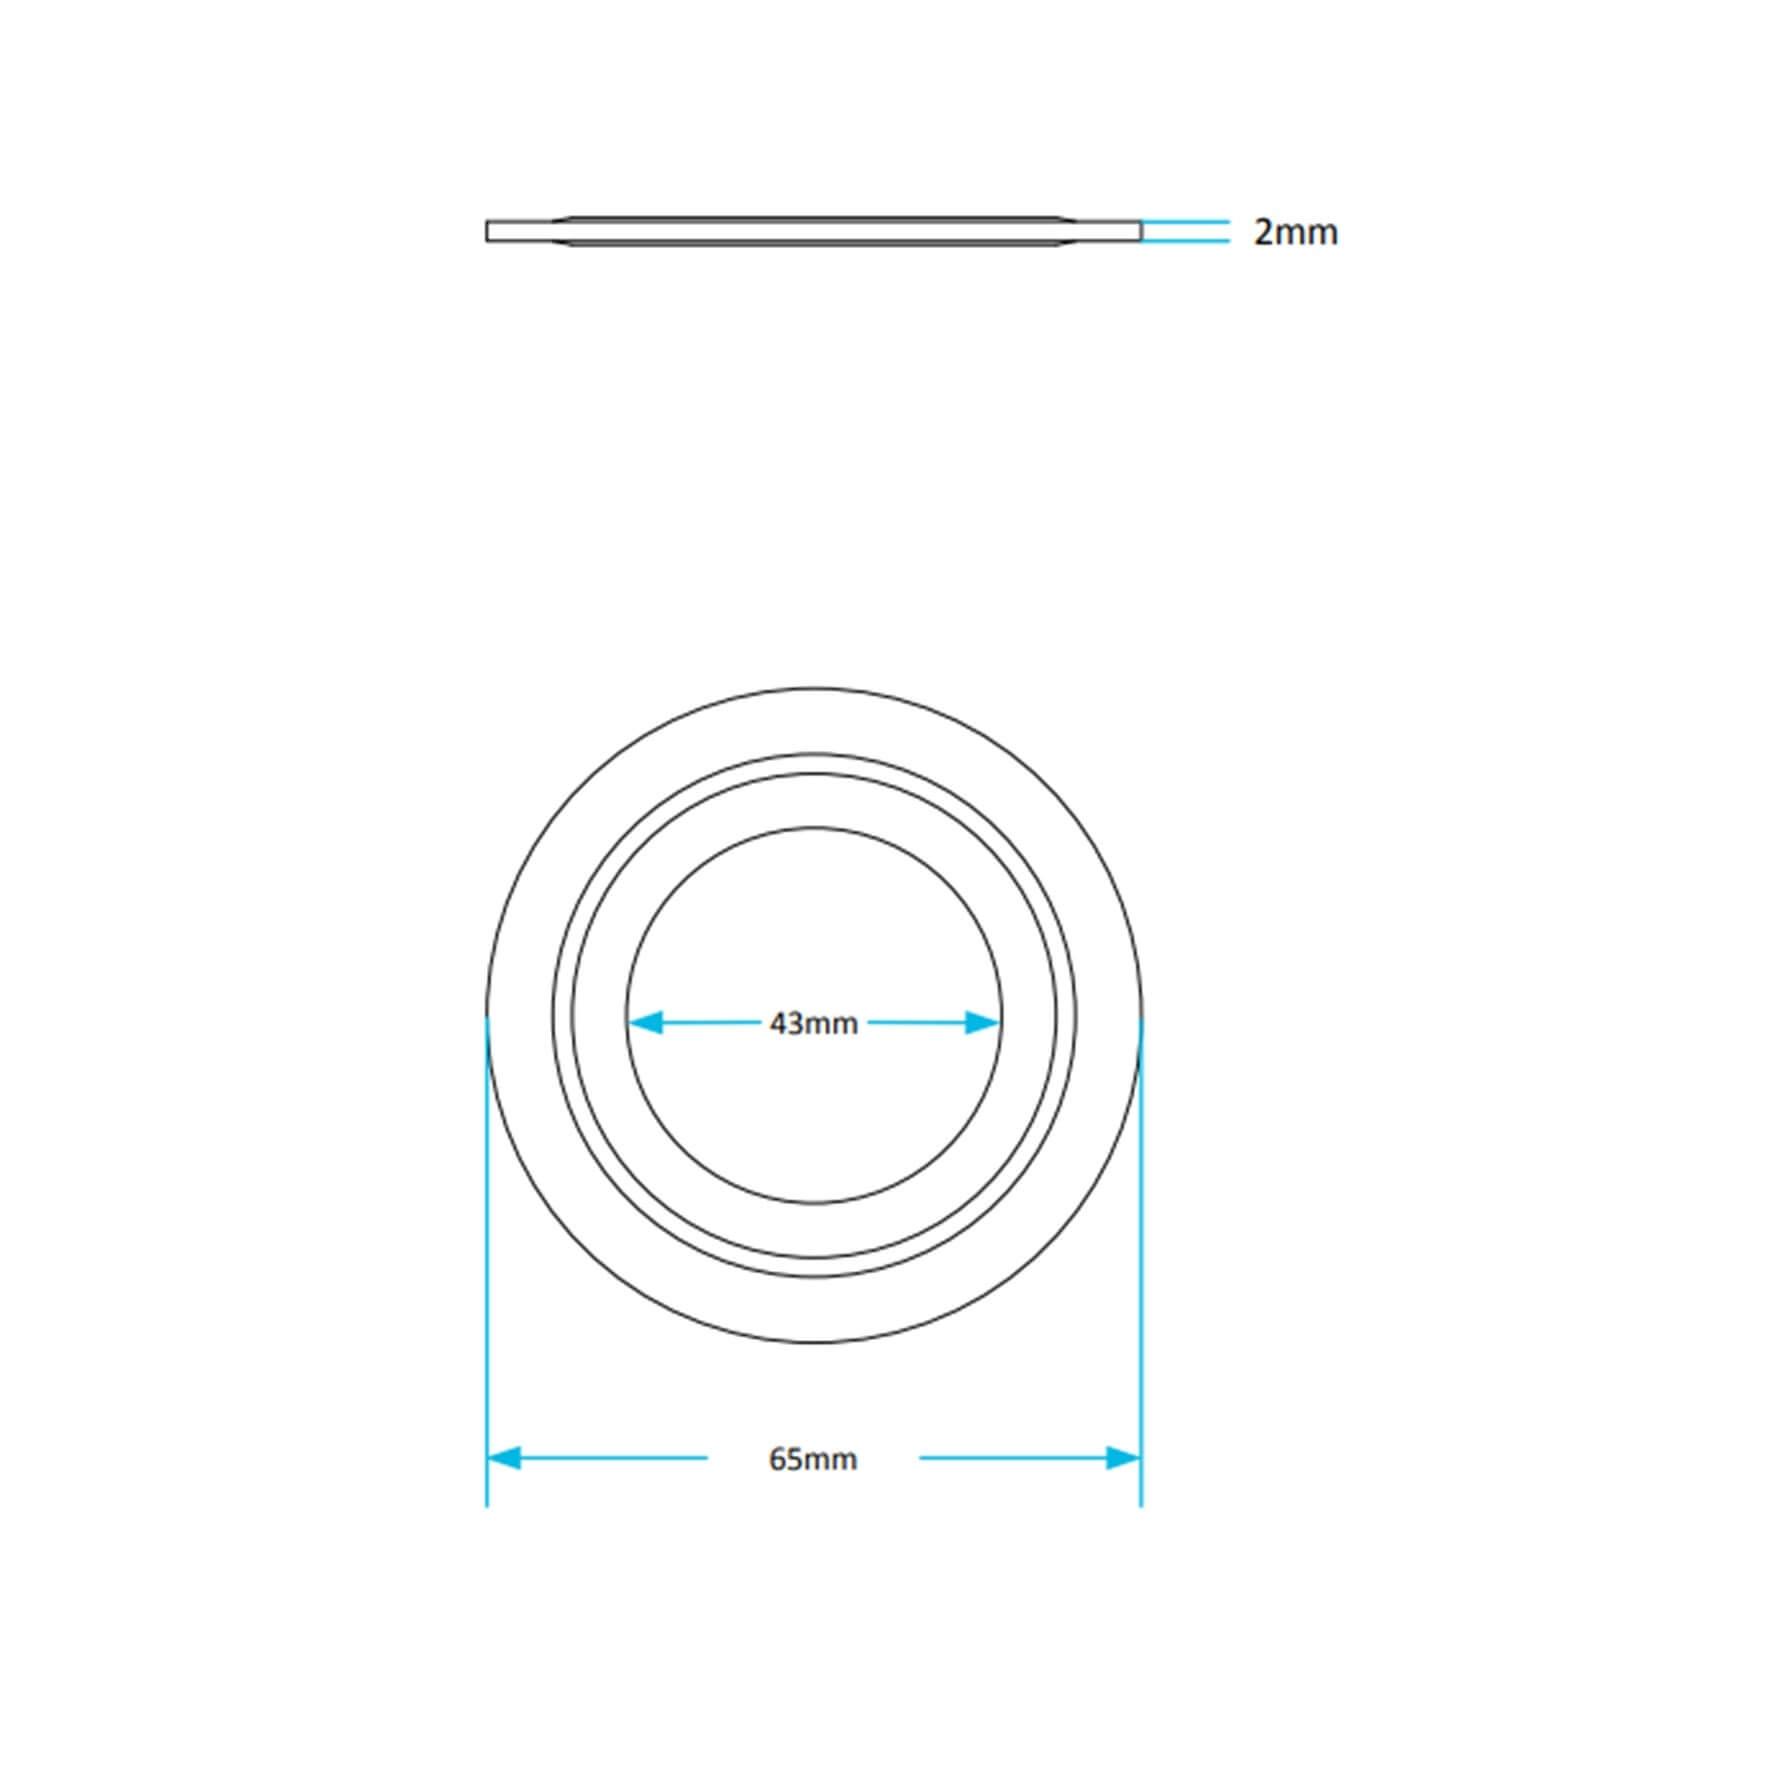 Viva Skylo Seal SKY095 measurements